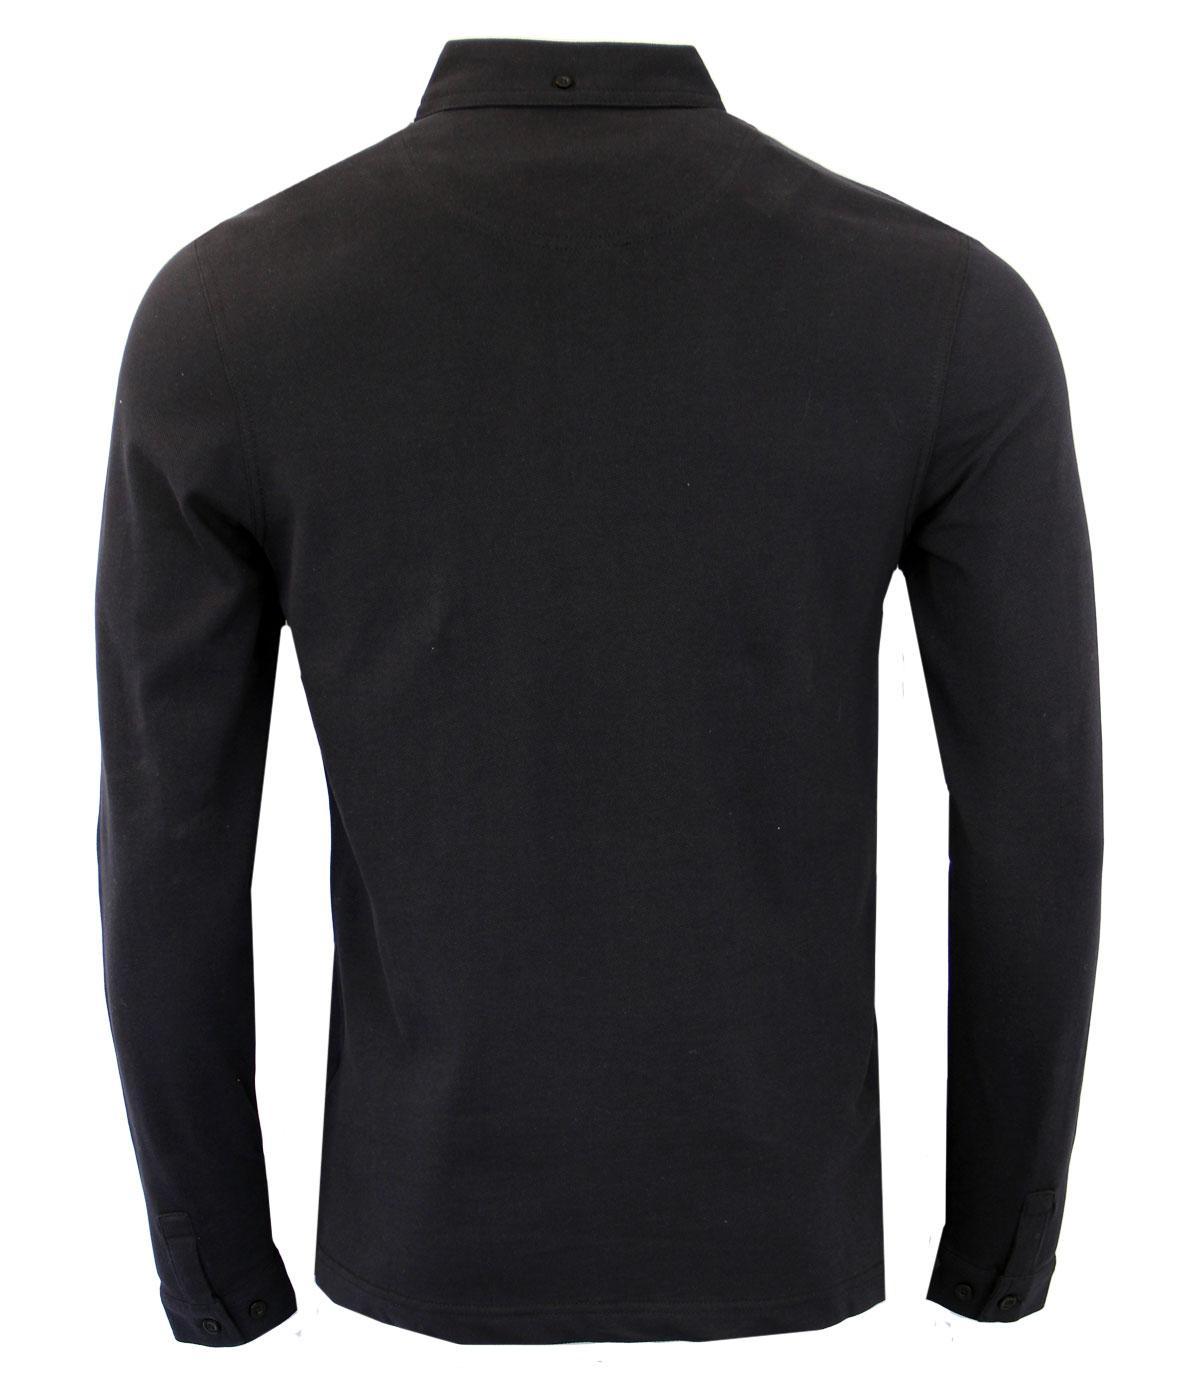 0b11165dbf Farah Vintage Merriweather Polo Shirt Black – EDGE Engineering and ...